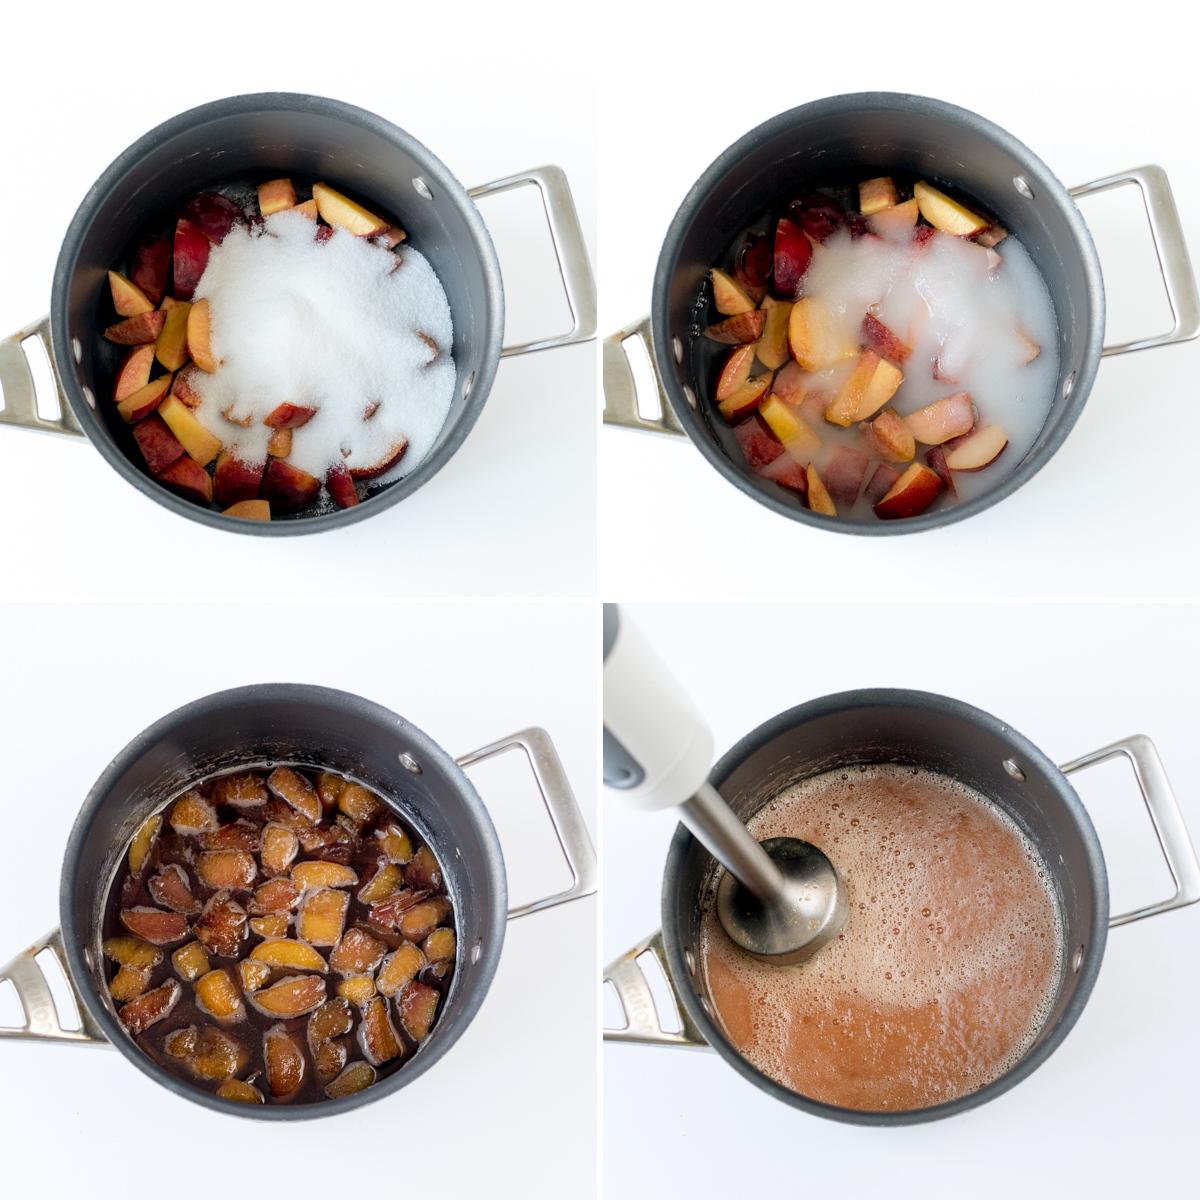 Peach and thyme iced tea step 1 collage